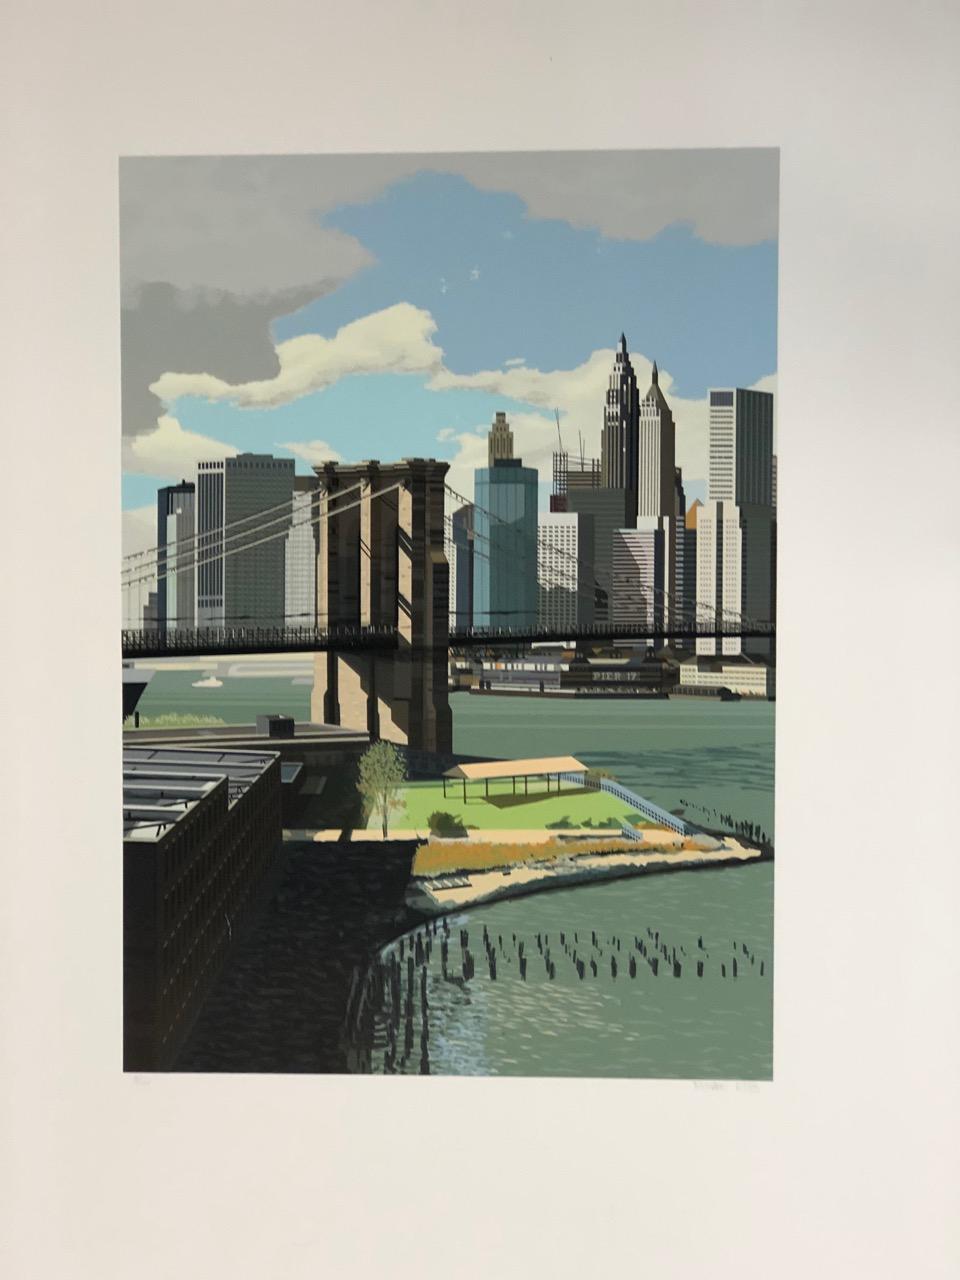 East River, New York by Richard Estes